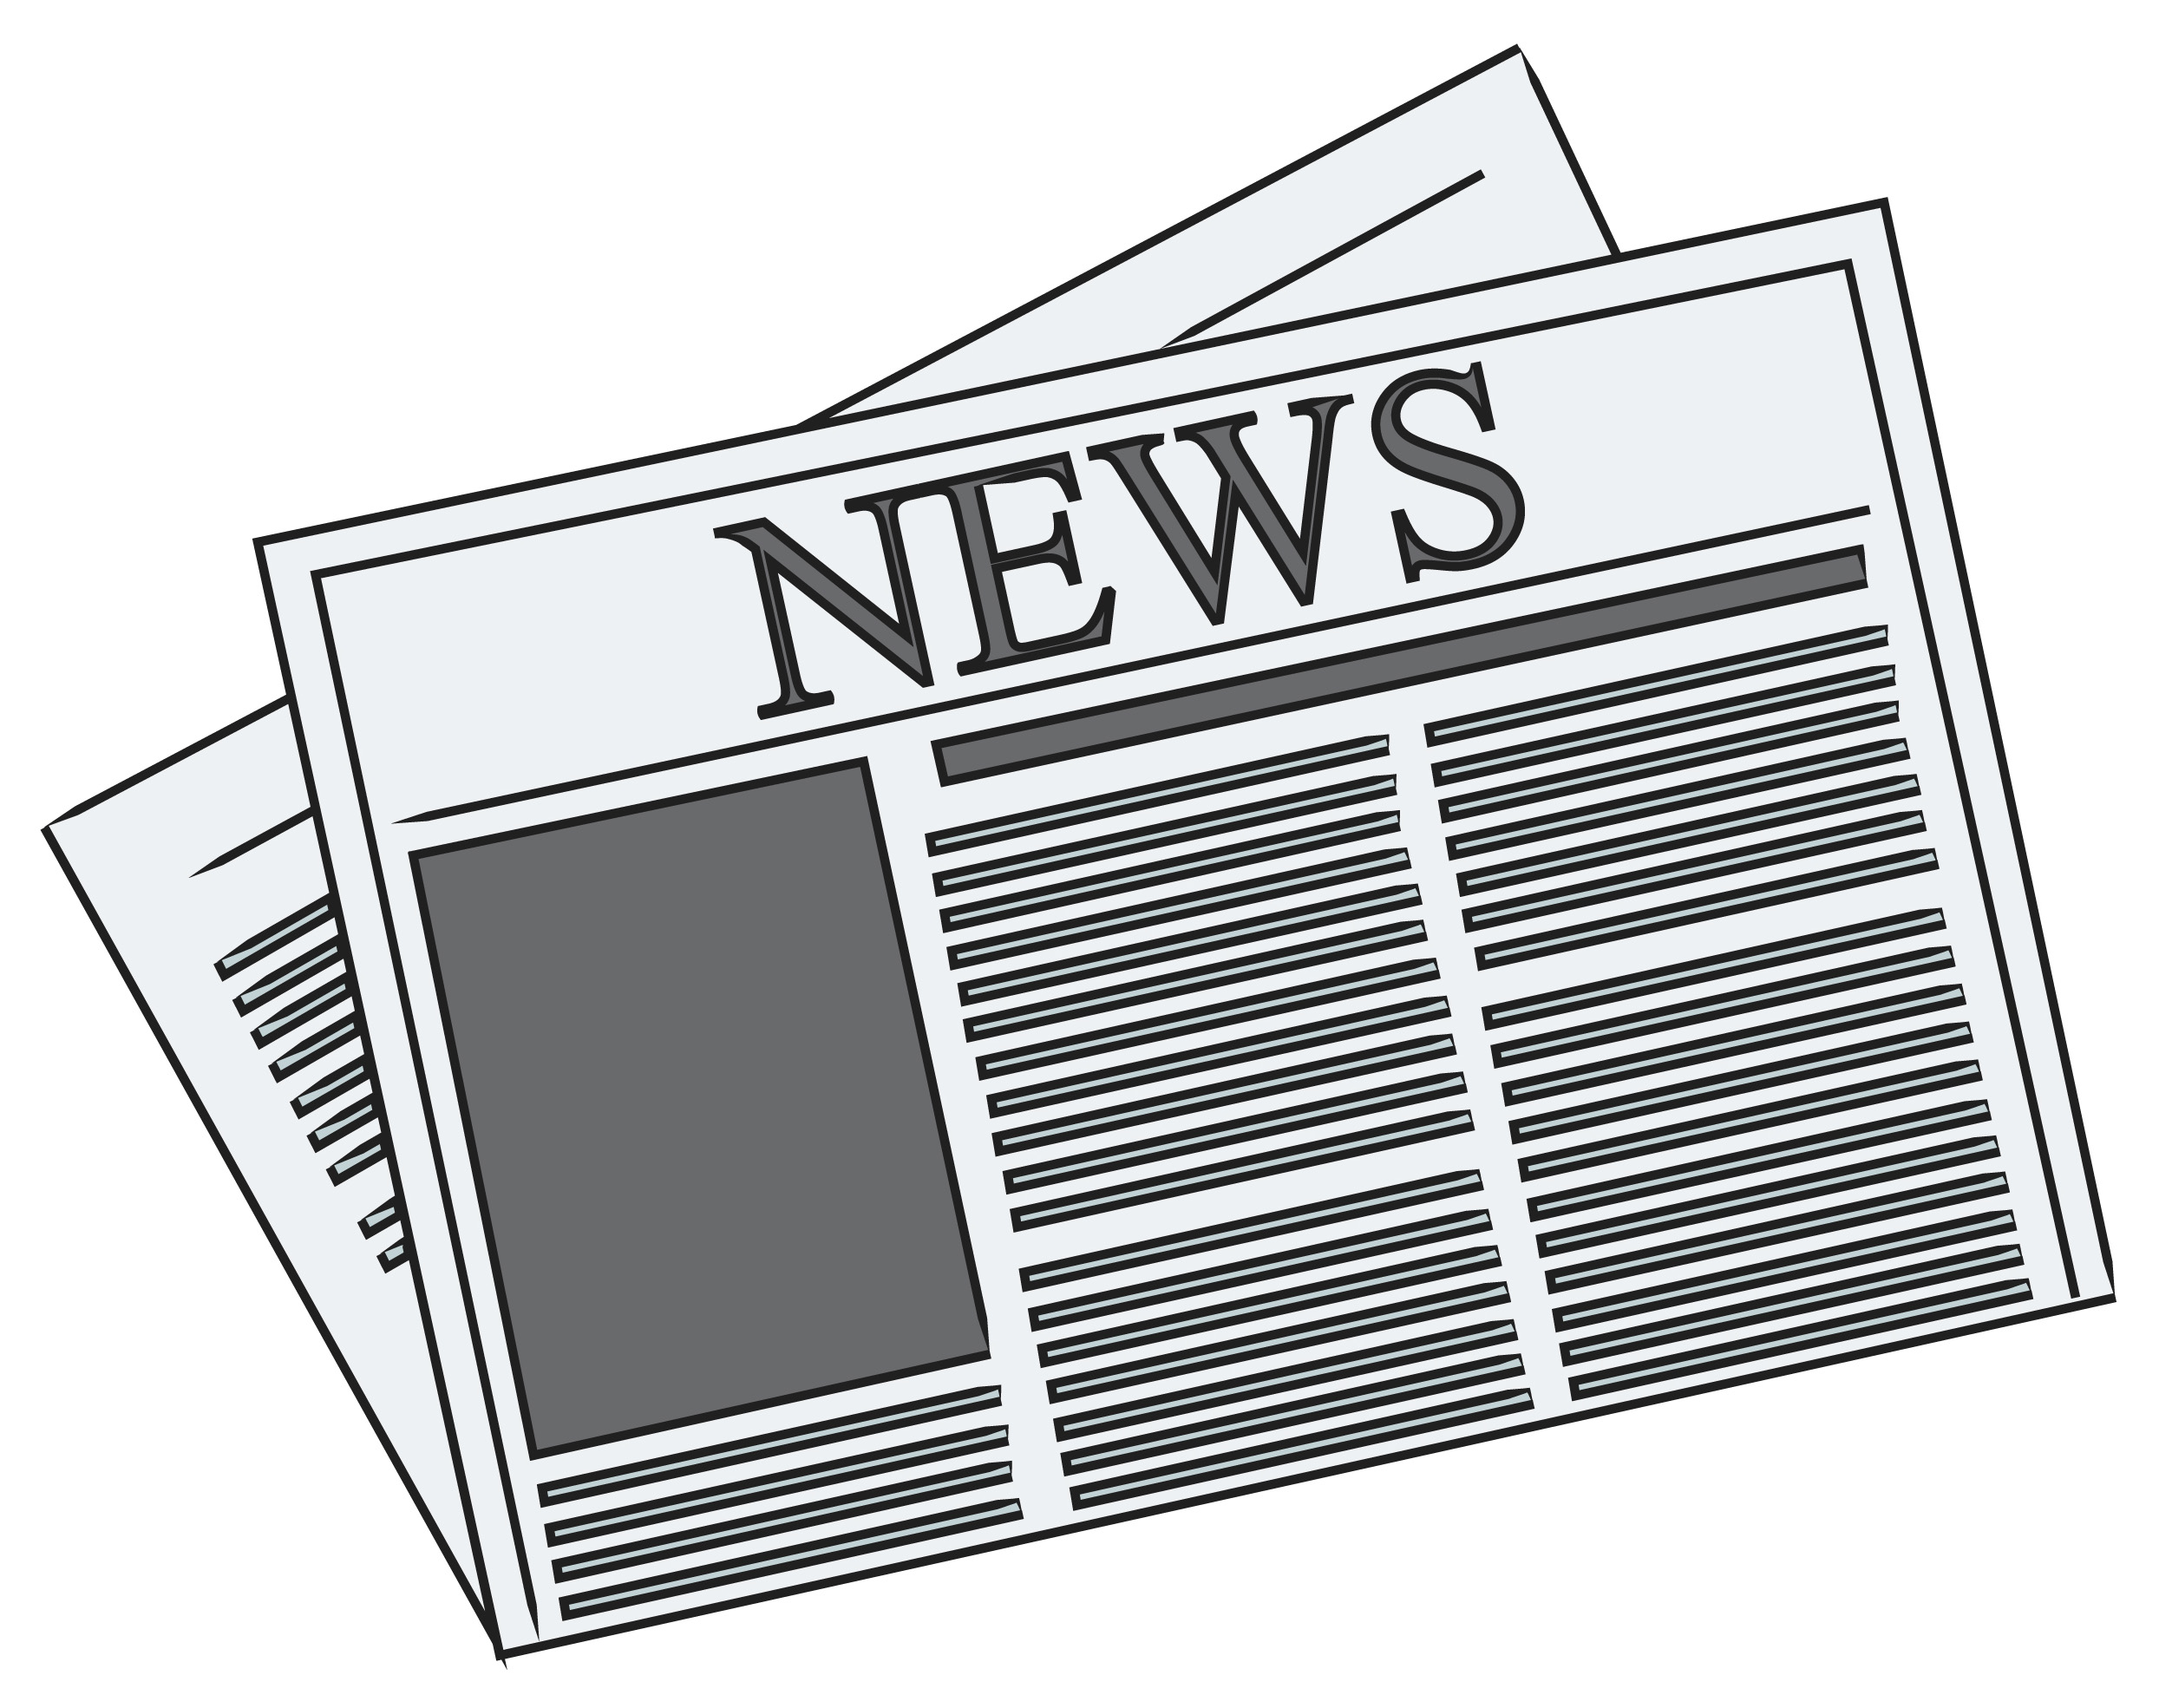 Newspaper — Insight